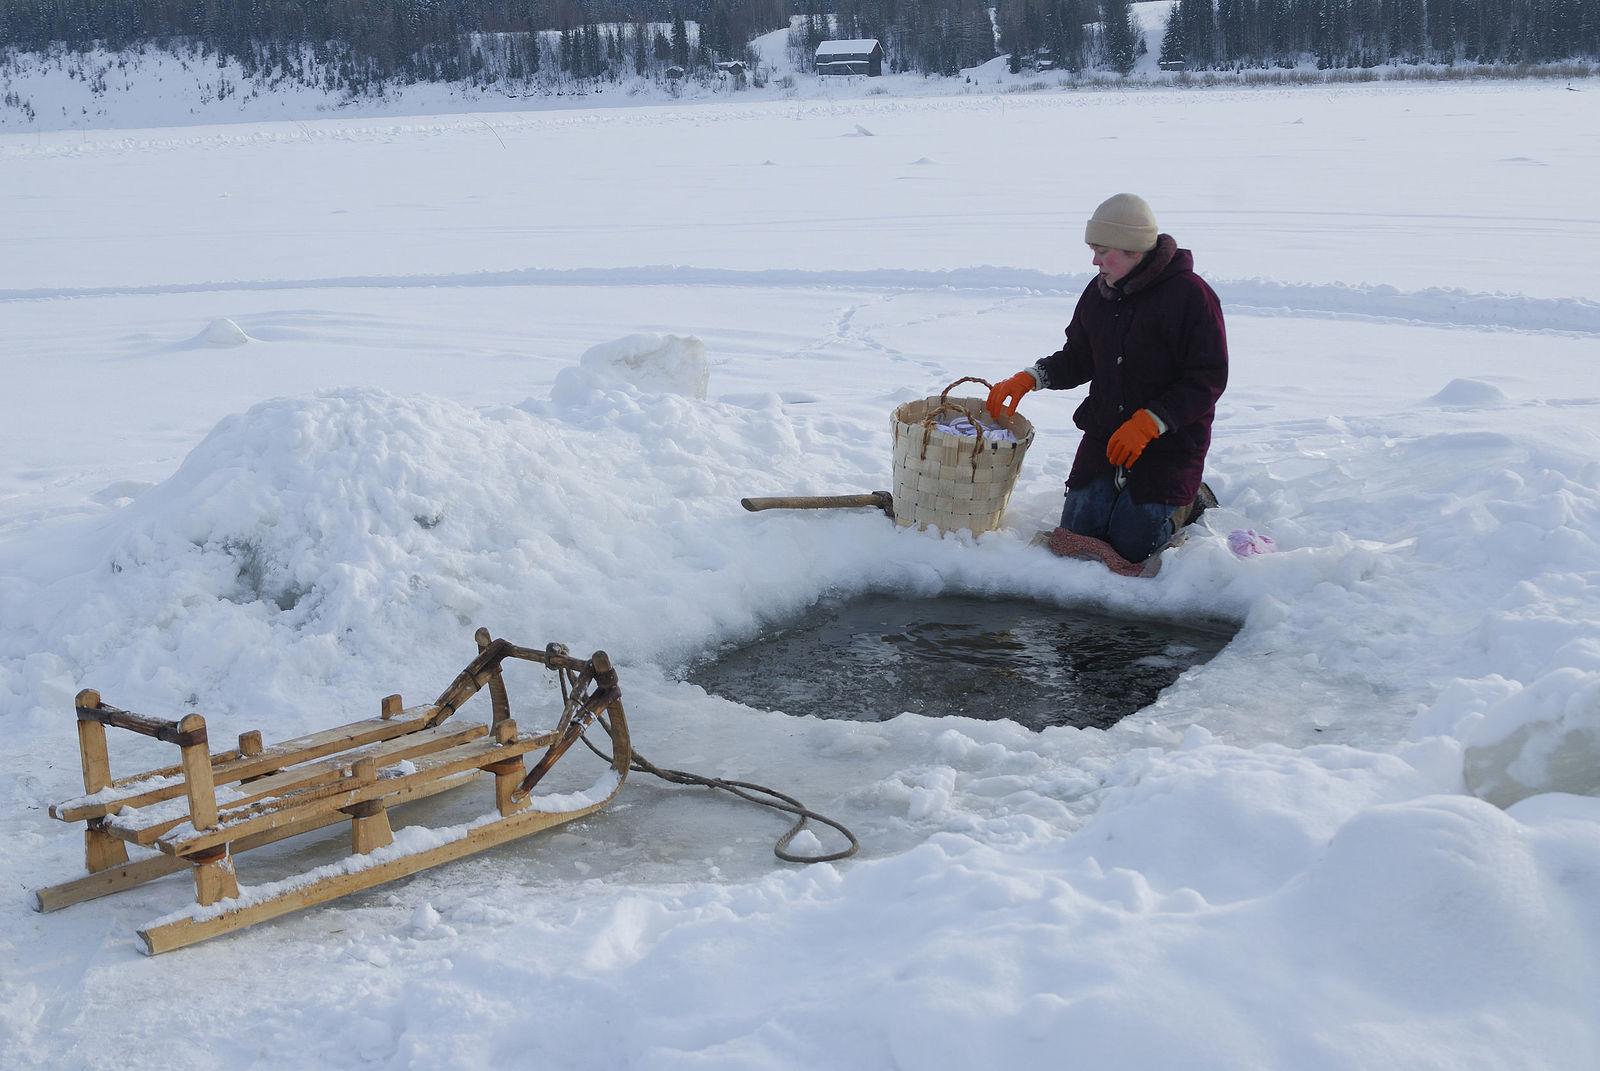 Arik Shraga. Neglected in the village. Rinsing ice-hole